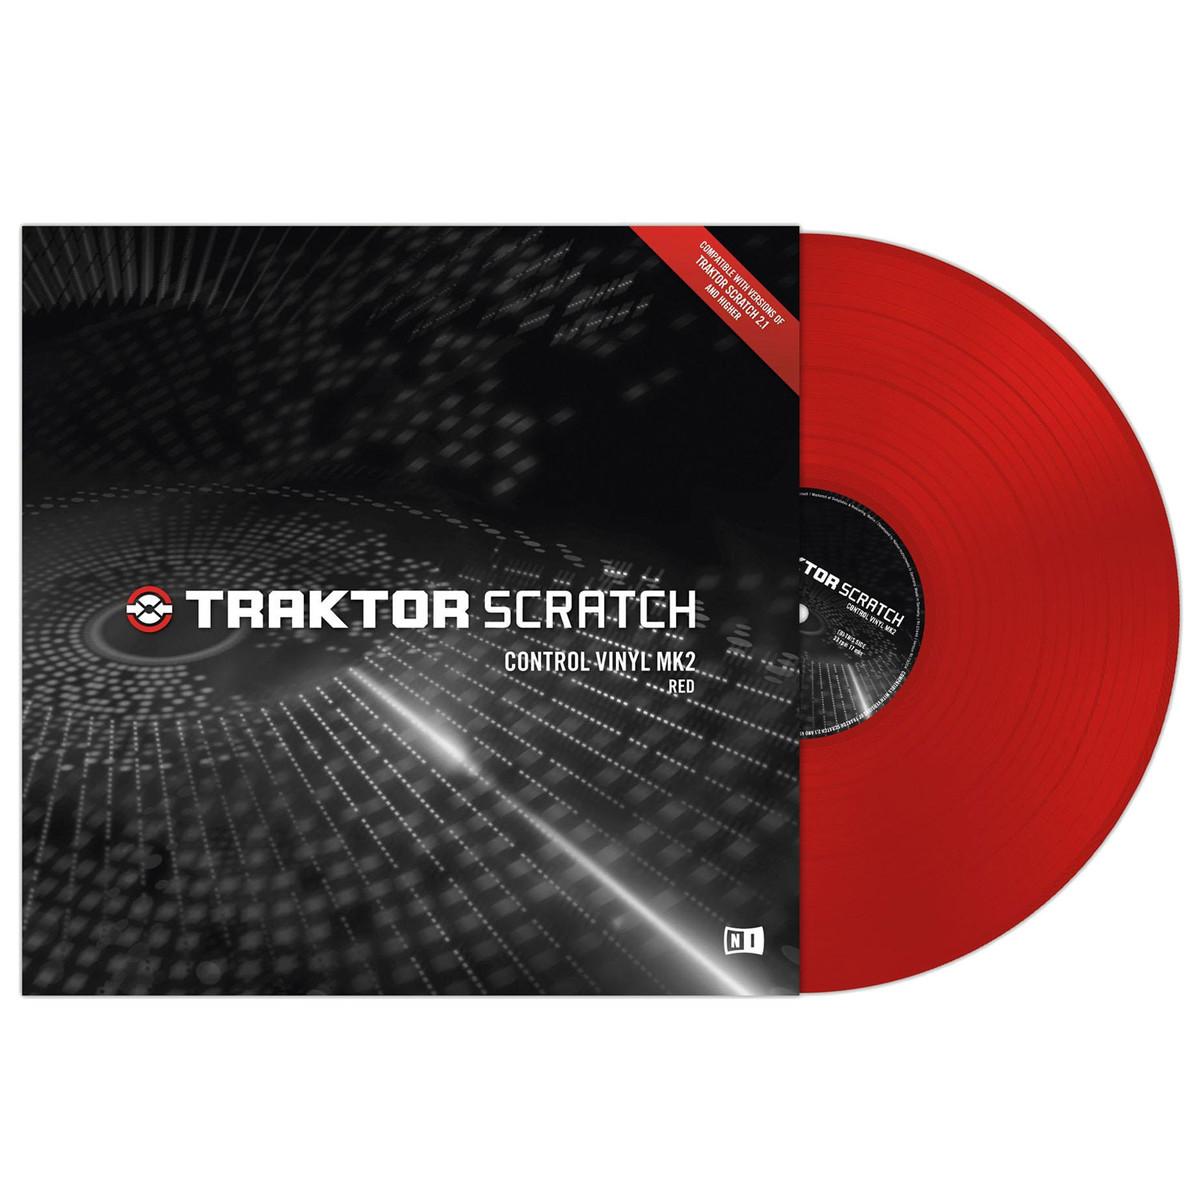 native instruments traktor scratch control vinyl mk2 red at gear4music. Black Bedroom Furniture Sets. Home Design Ideas